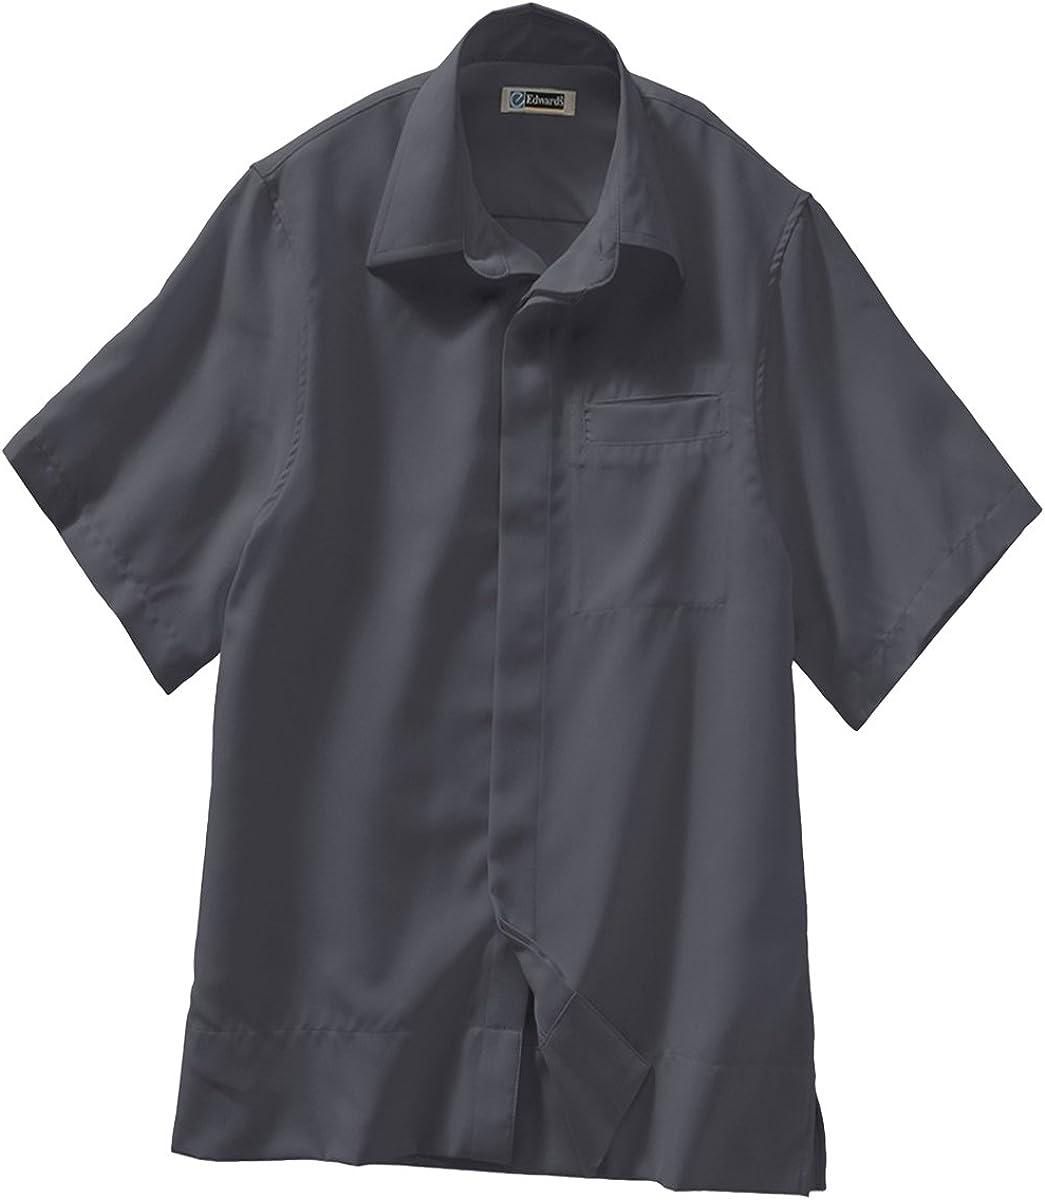 Edwards Batiste Camp Shirt